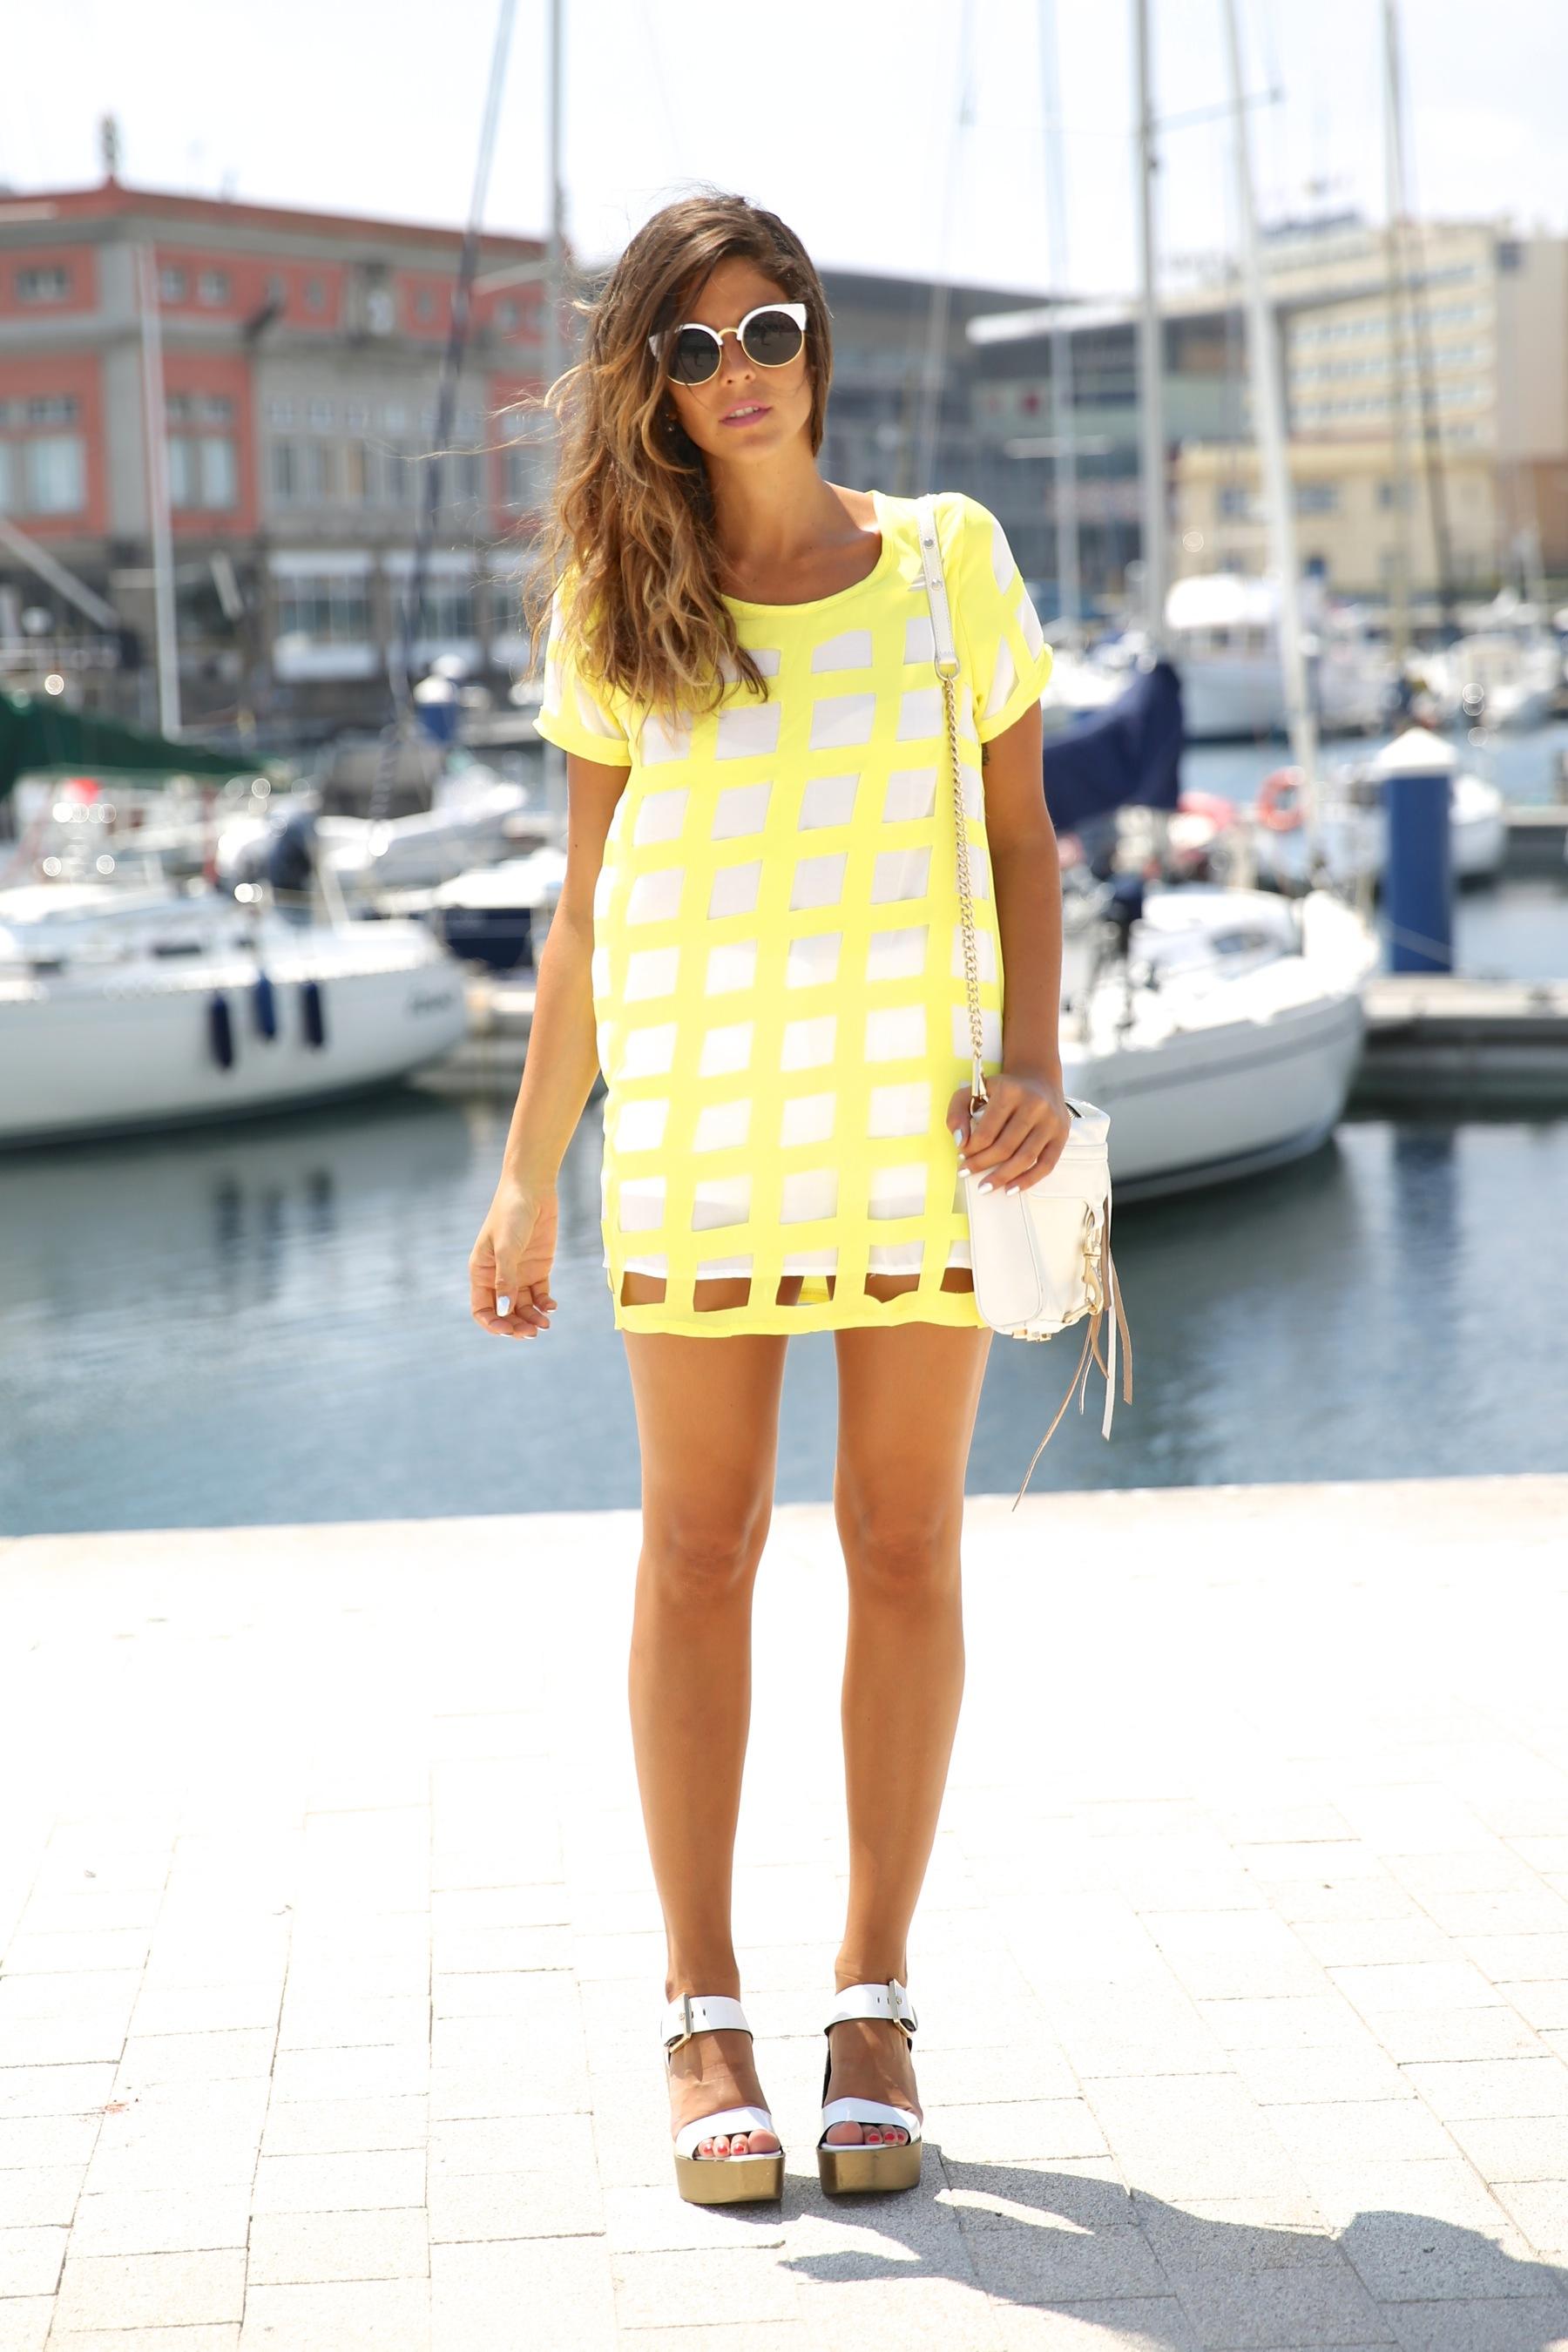 trendy_taste-look-outfit-street_style-ootd-blog-blogger-moda_españa-fashion_spain-coruña-galicia-sandalias_plataforma-platform_sandals-rebecca_minkoff-yellow-amarillo-vestido-dress-plaid-cuadros-12